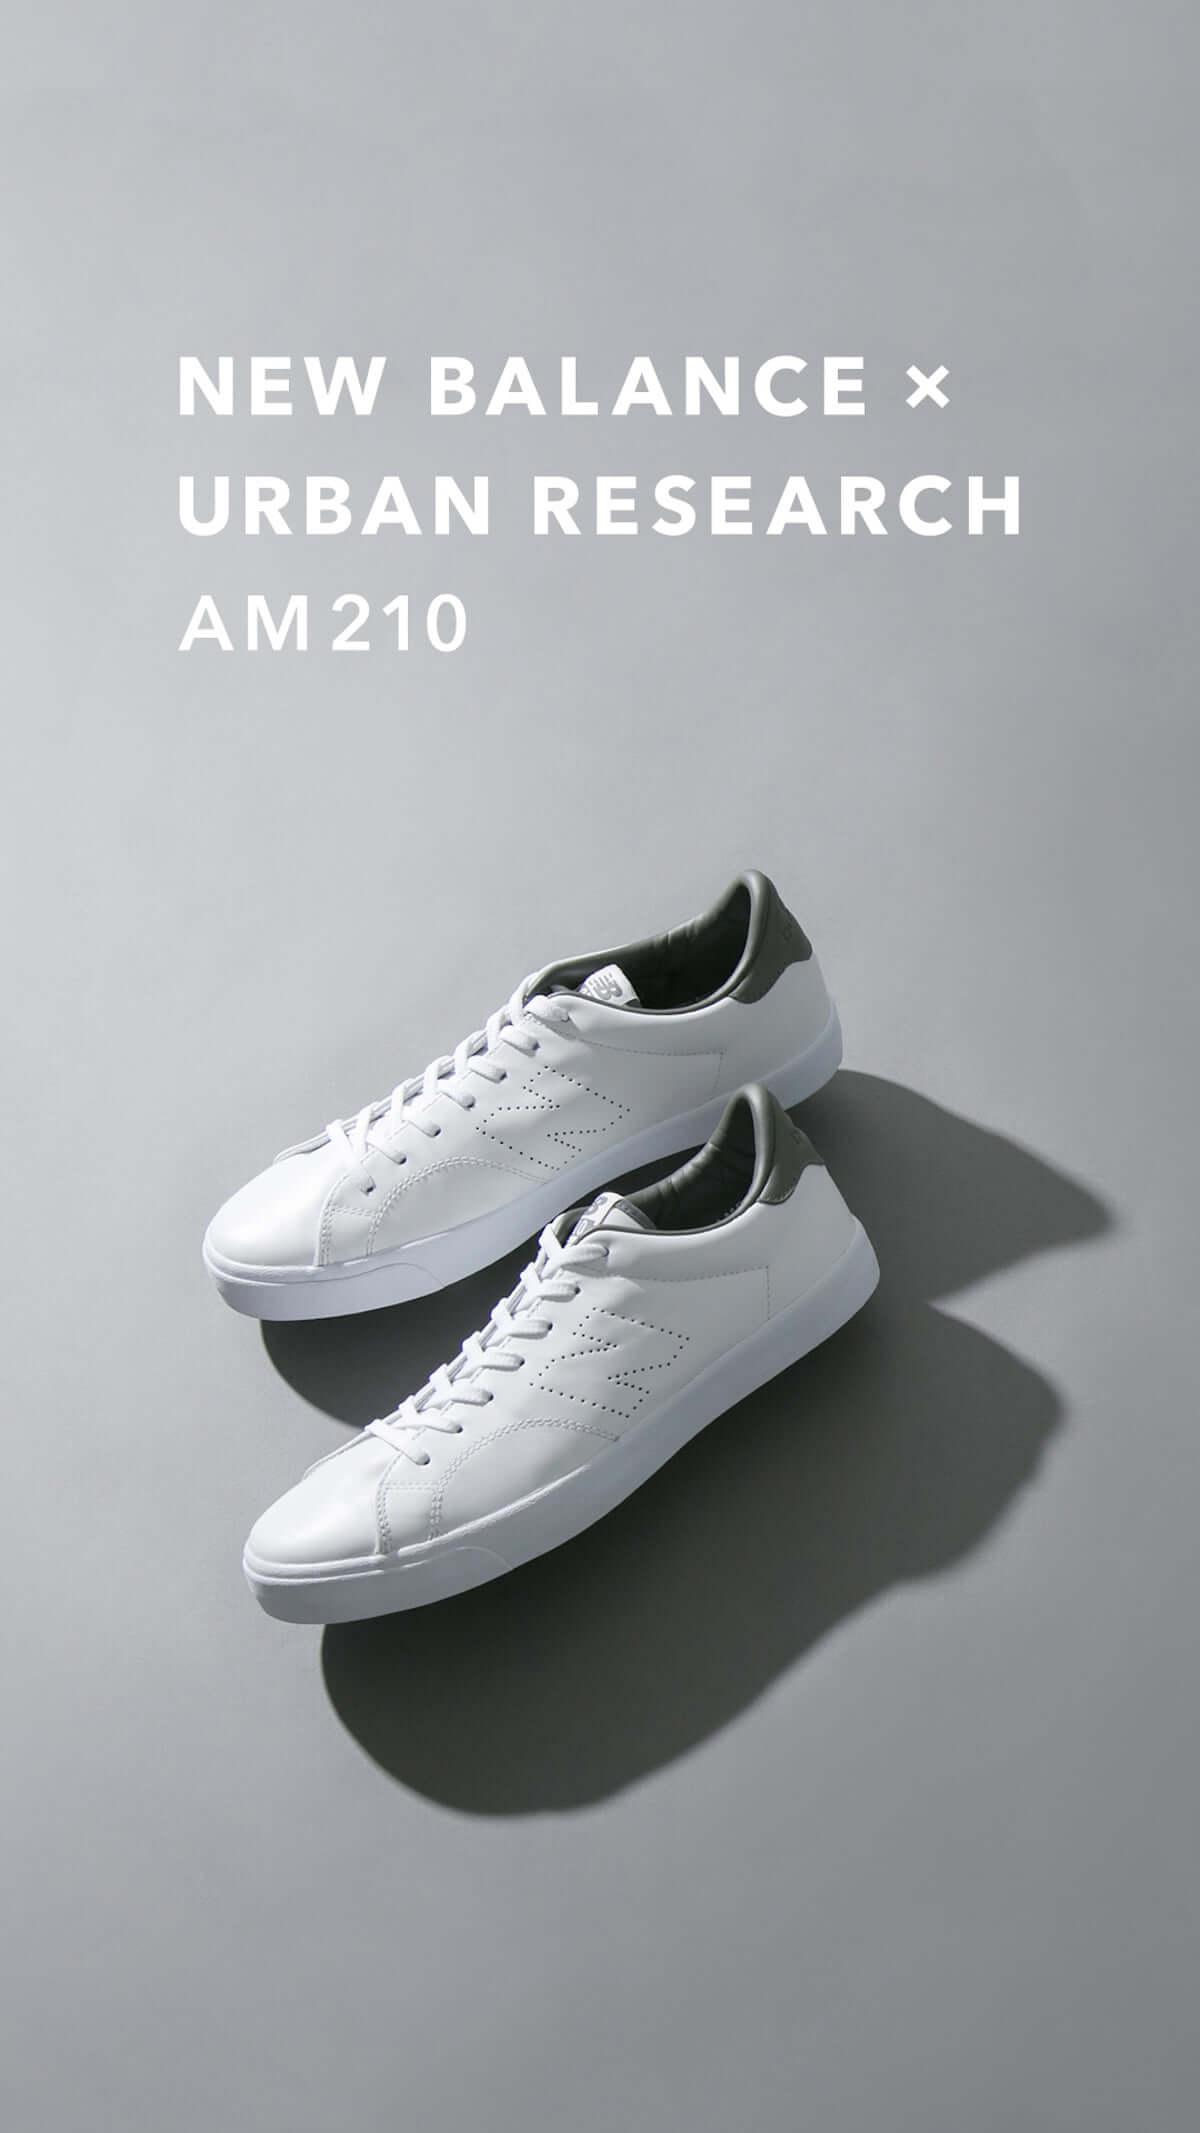 new balance × URBAN RESEARCH AM210ユニセックスの別注モデル登場! fashion180925_urban-research-newbalance_1-1200x2133